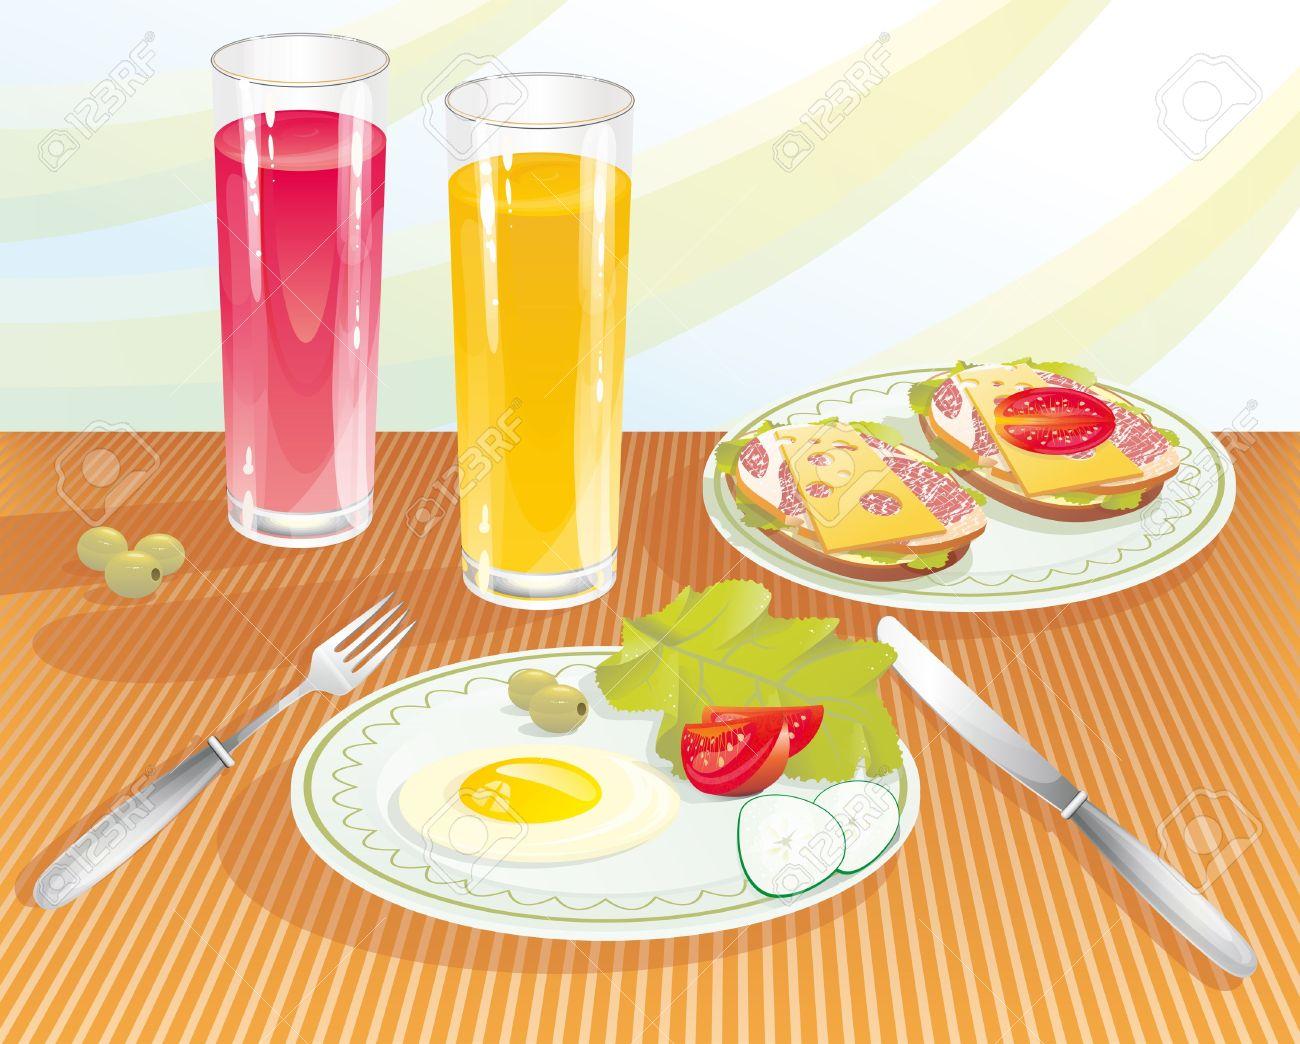 Breakfast table clipart.